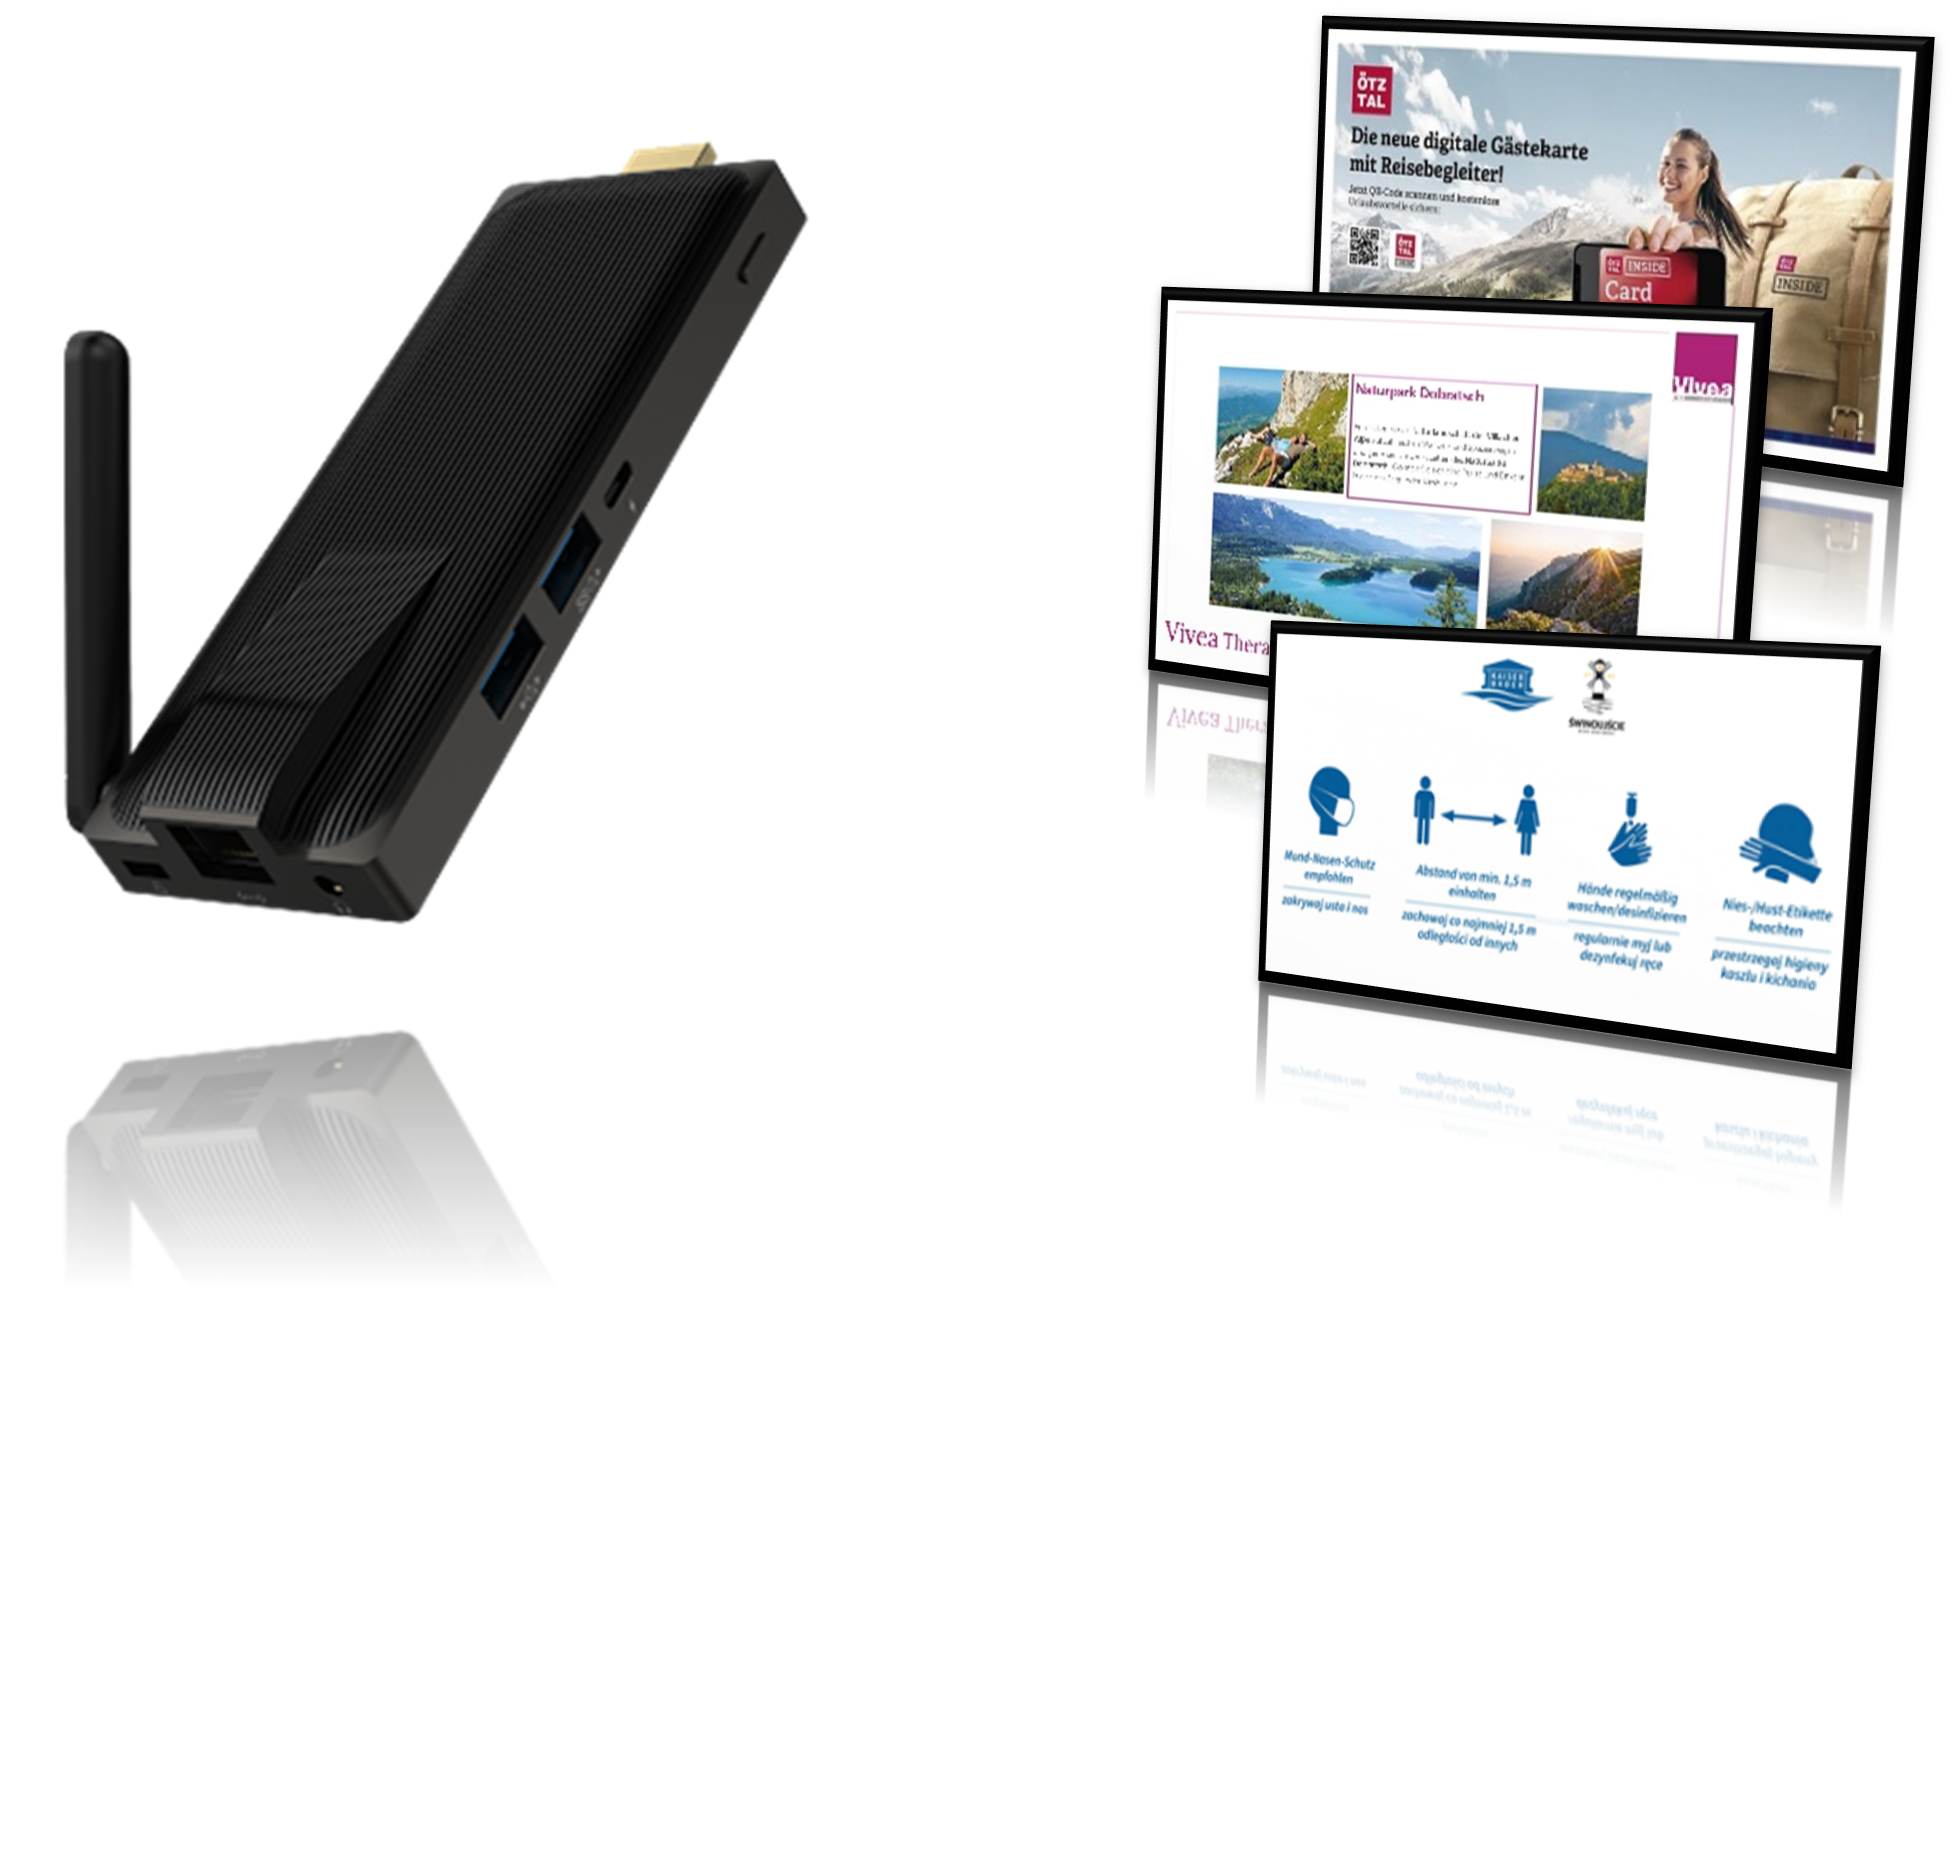 https://tourismus-interaktiv.com/wp-content/uploads/2021/10/Stick-mit-Bildschirm.png